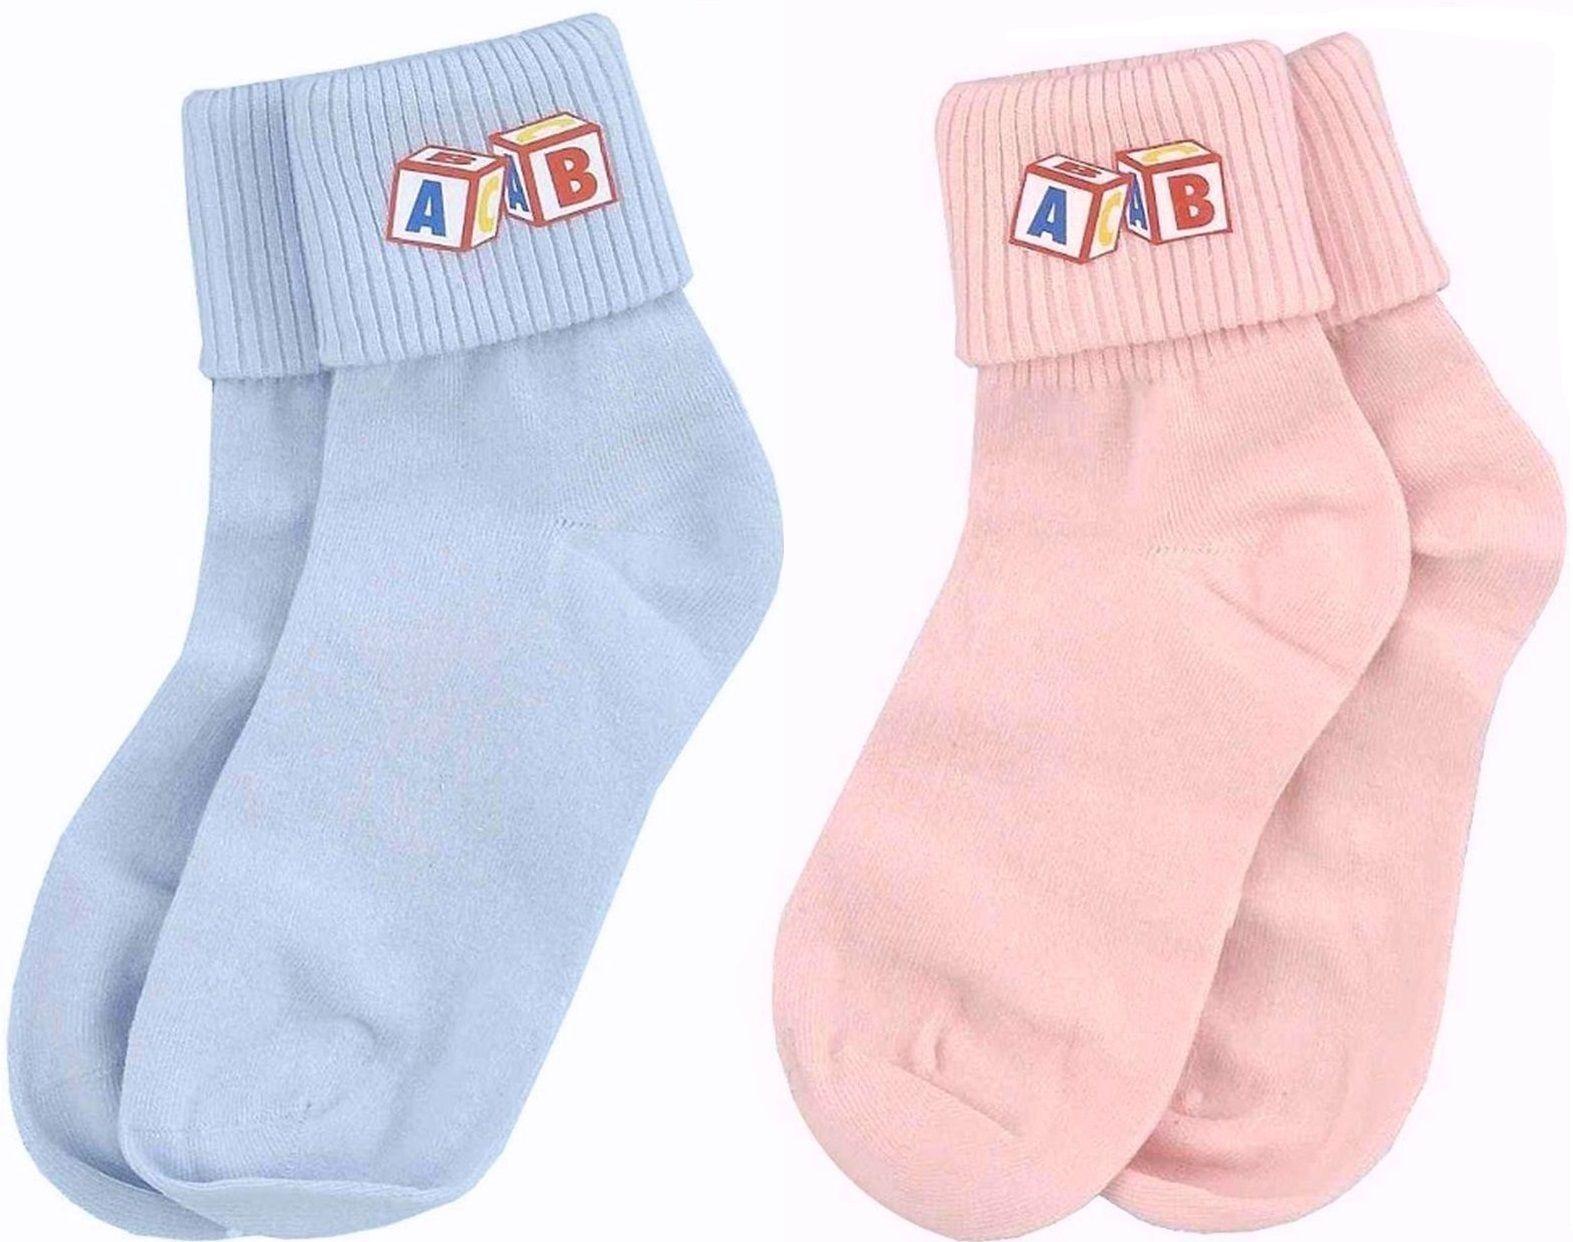 Adult Big Baby Ankle Socks Men Women Pink Blue Funny Costume